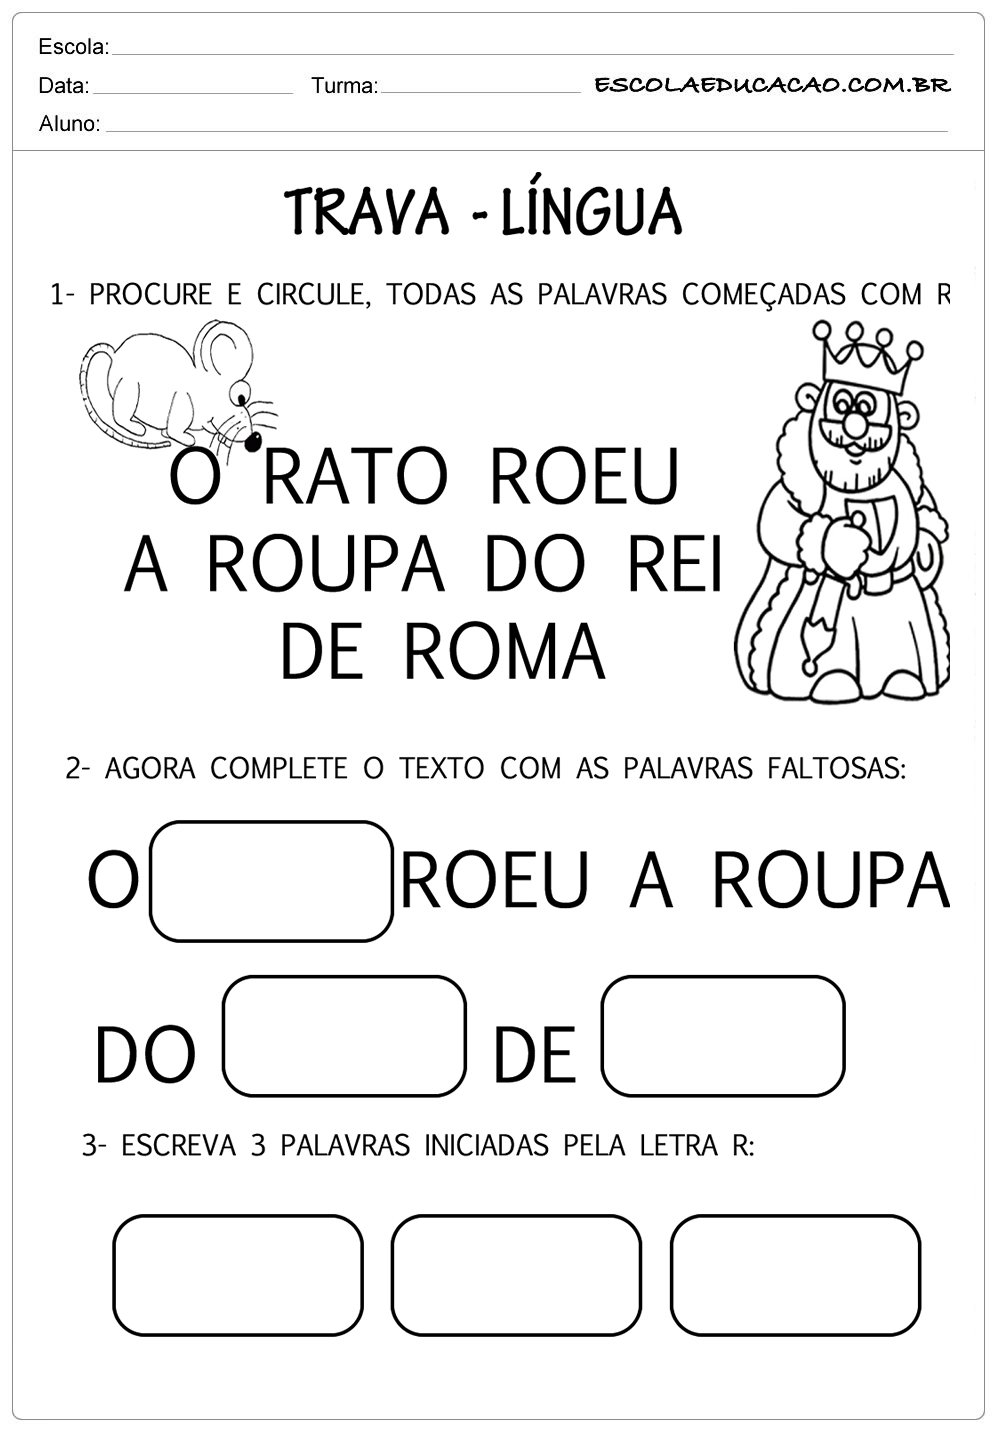 Trava língua letra R